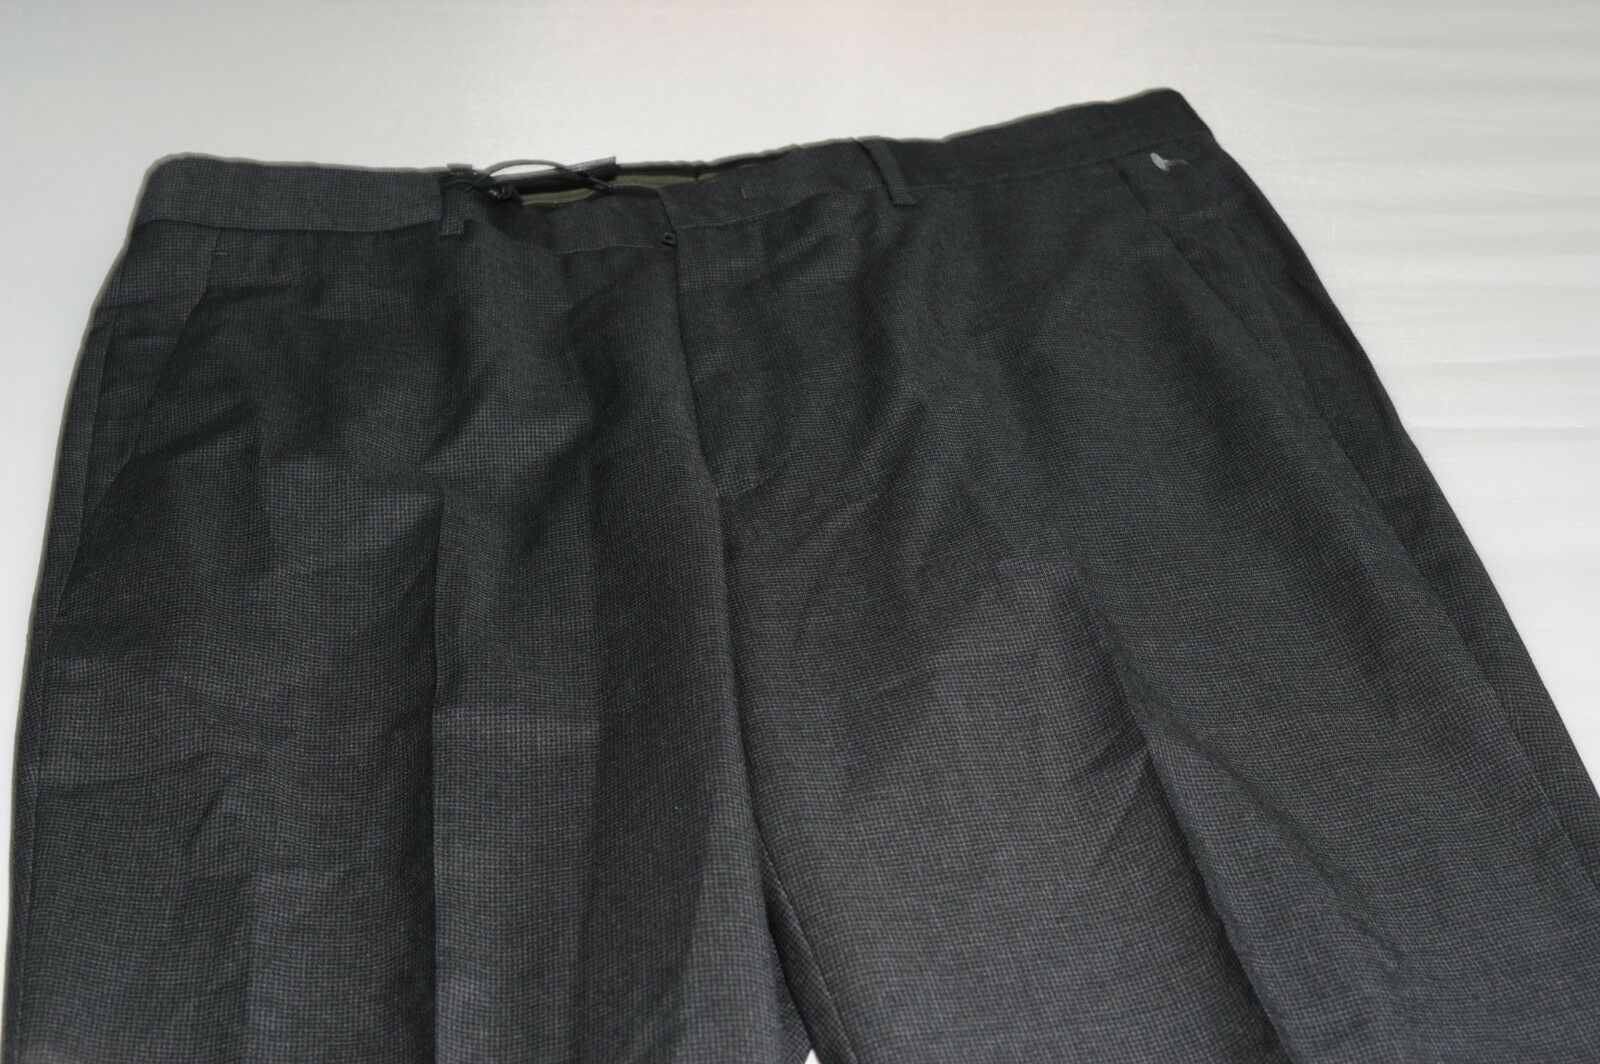 NWOT Z Zegna Men's Flat Front 100% Wool Dress Pants Waist 35 (50R)